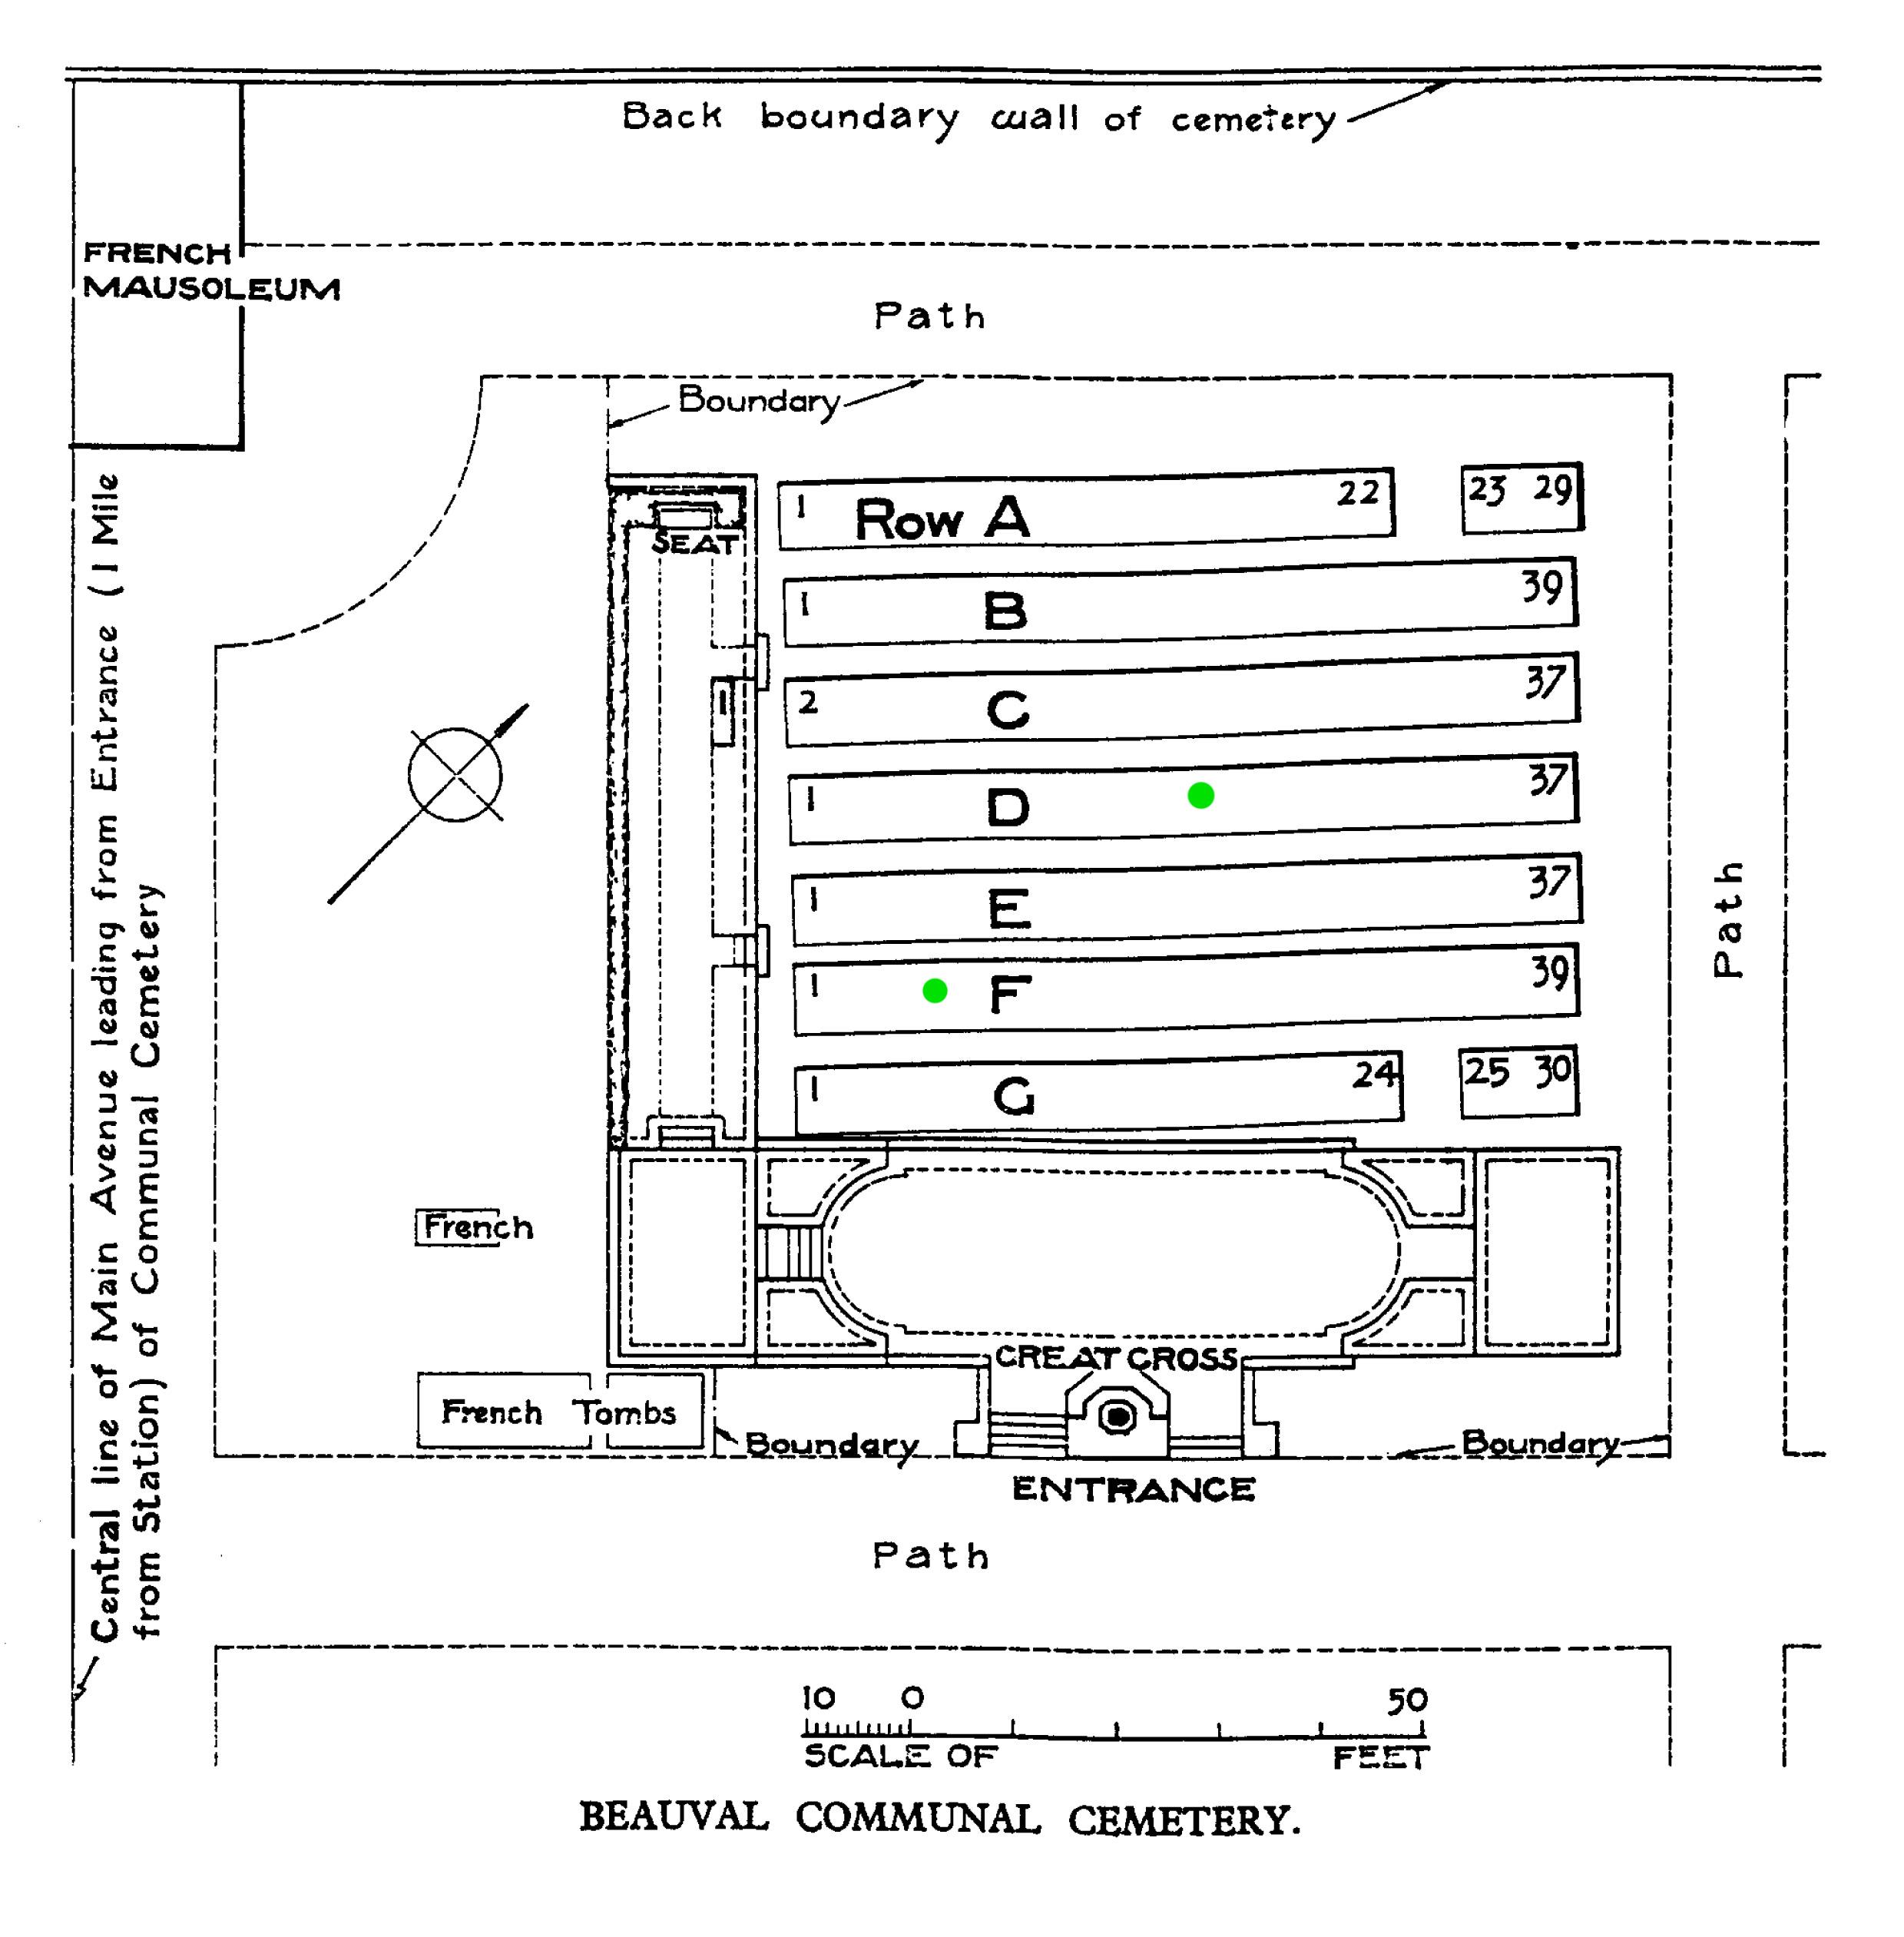 Beauval Communal Cemetery